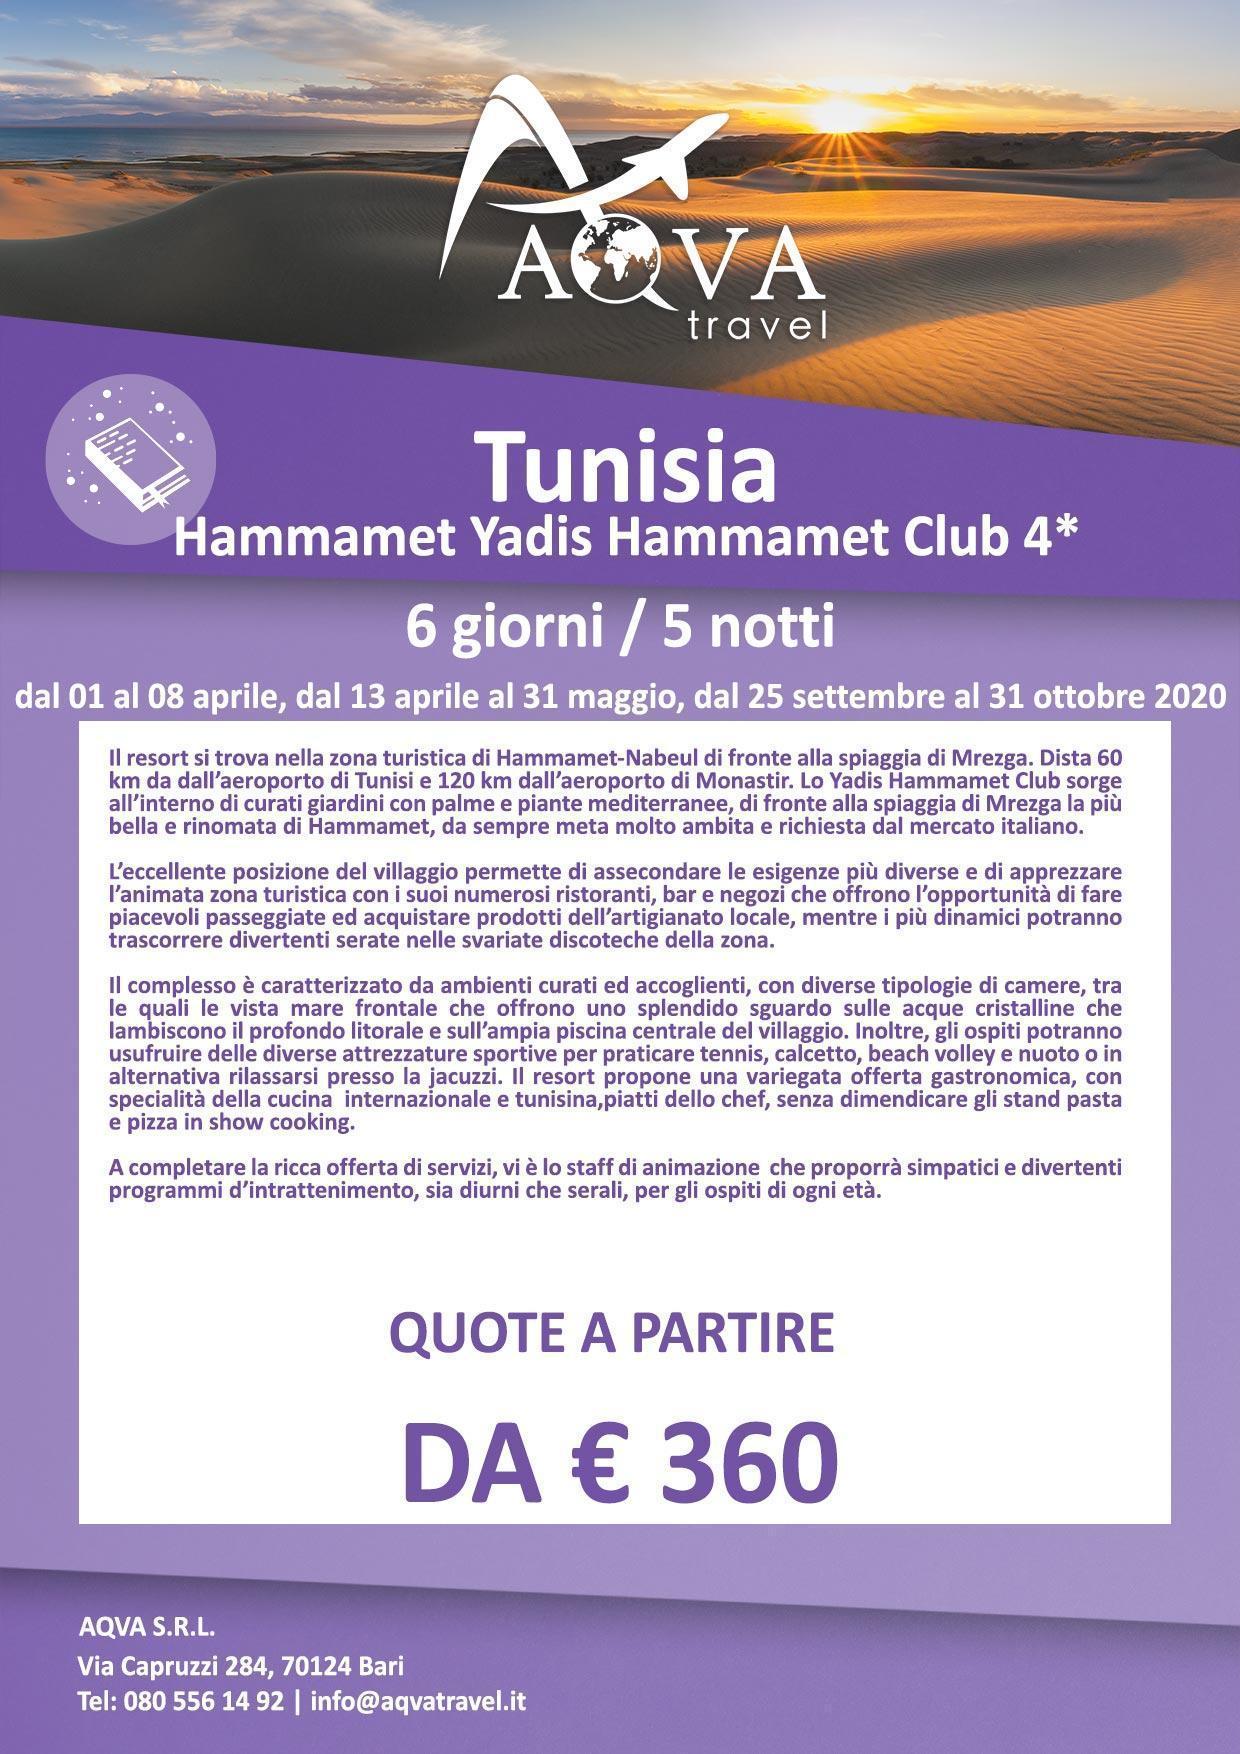 1-Tunisia-Hammamet-Yadis-Hammamet-Club-Cultura-offerte-agenzia-di-viaggi-Bari-AQVATRAVEL-it